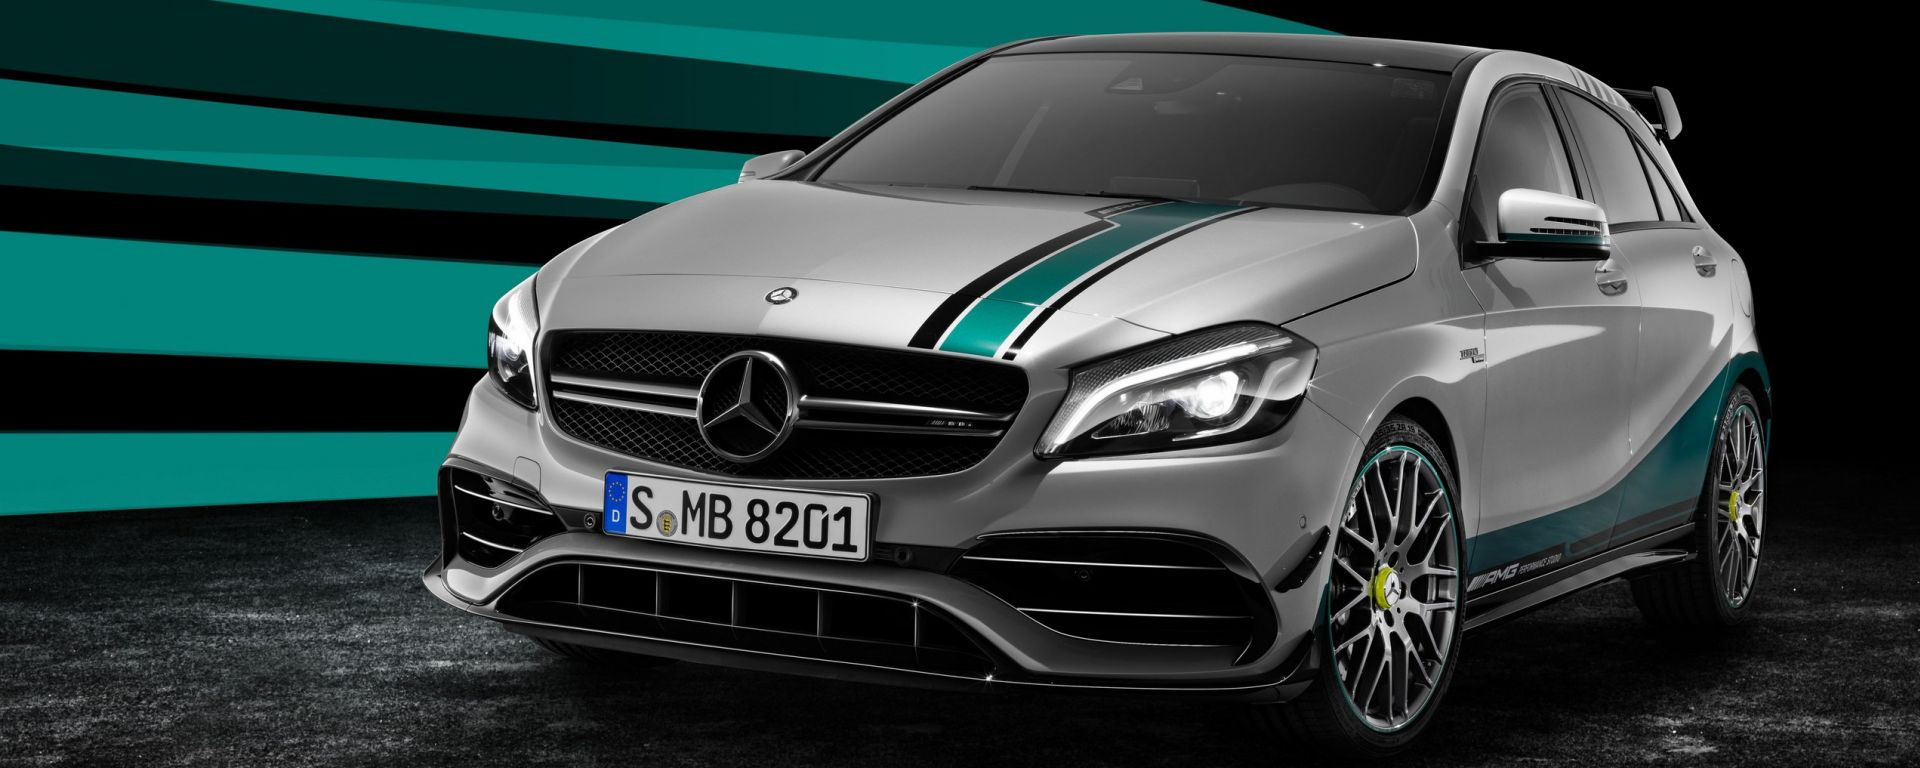 Mercedes A 45 AMG World Champion Edition